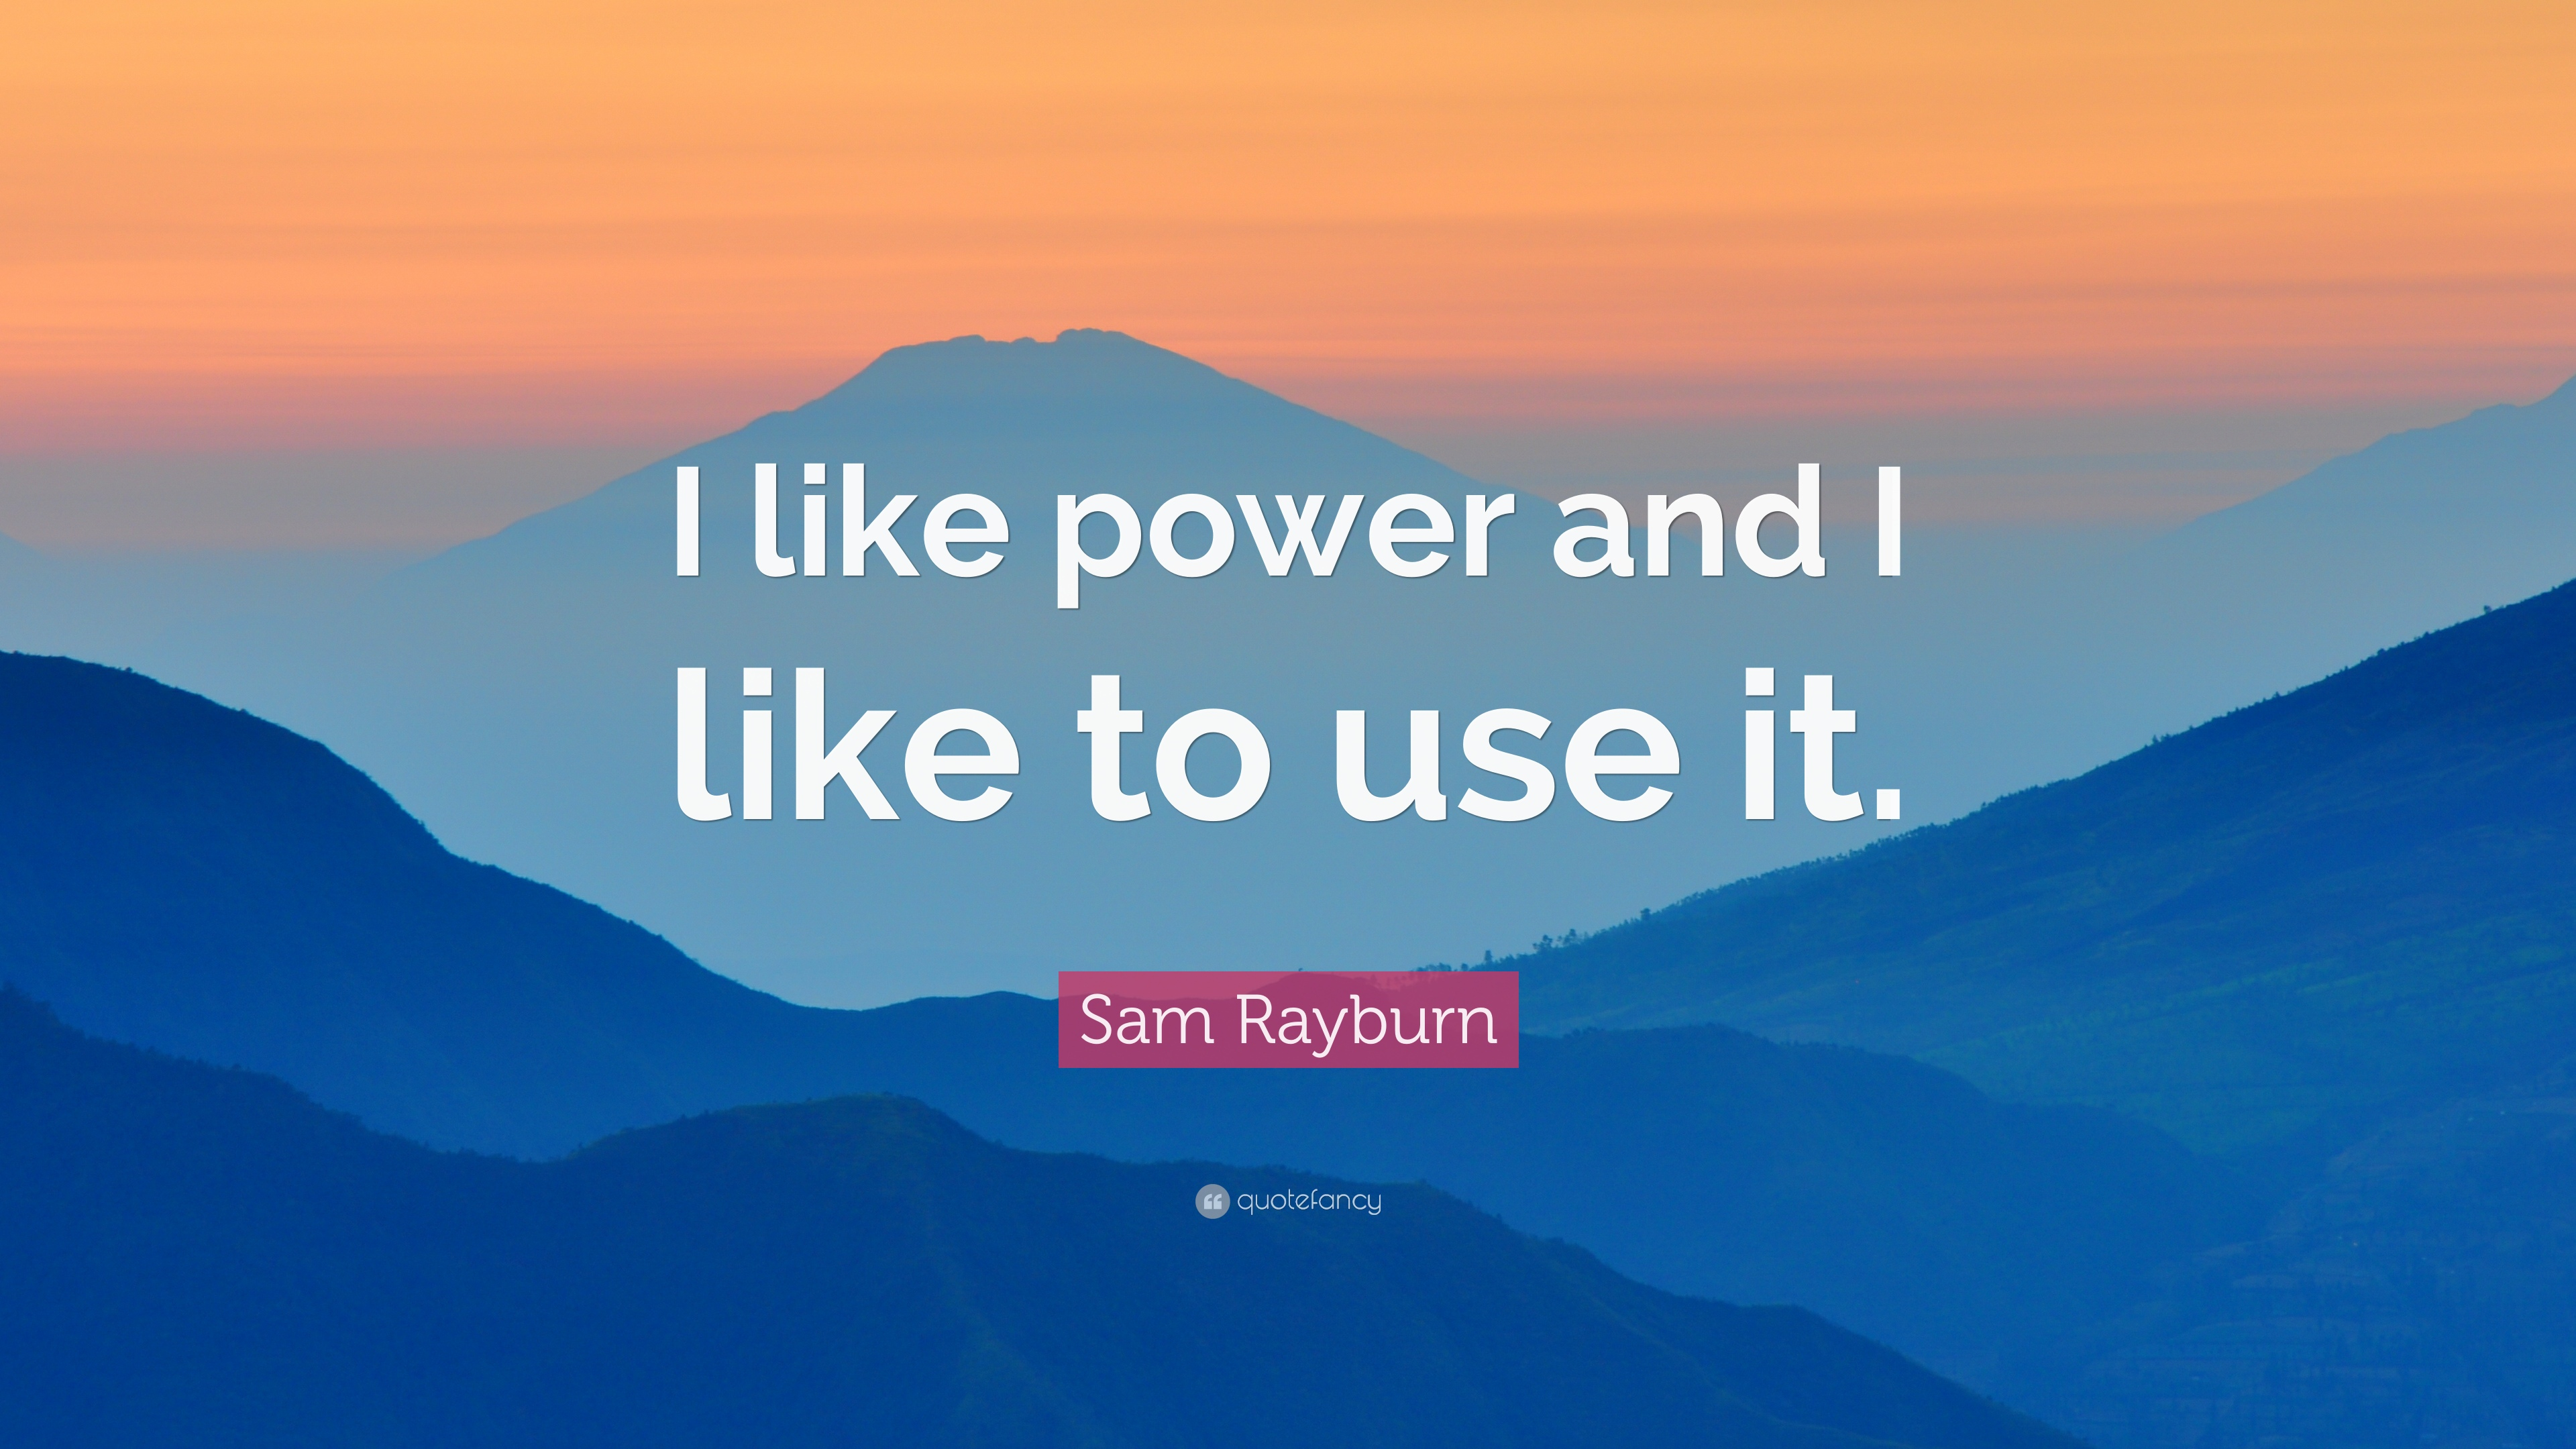 sam rayburn quotes